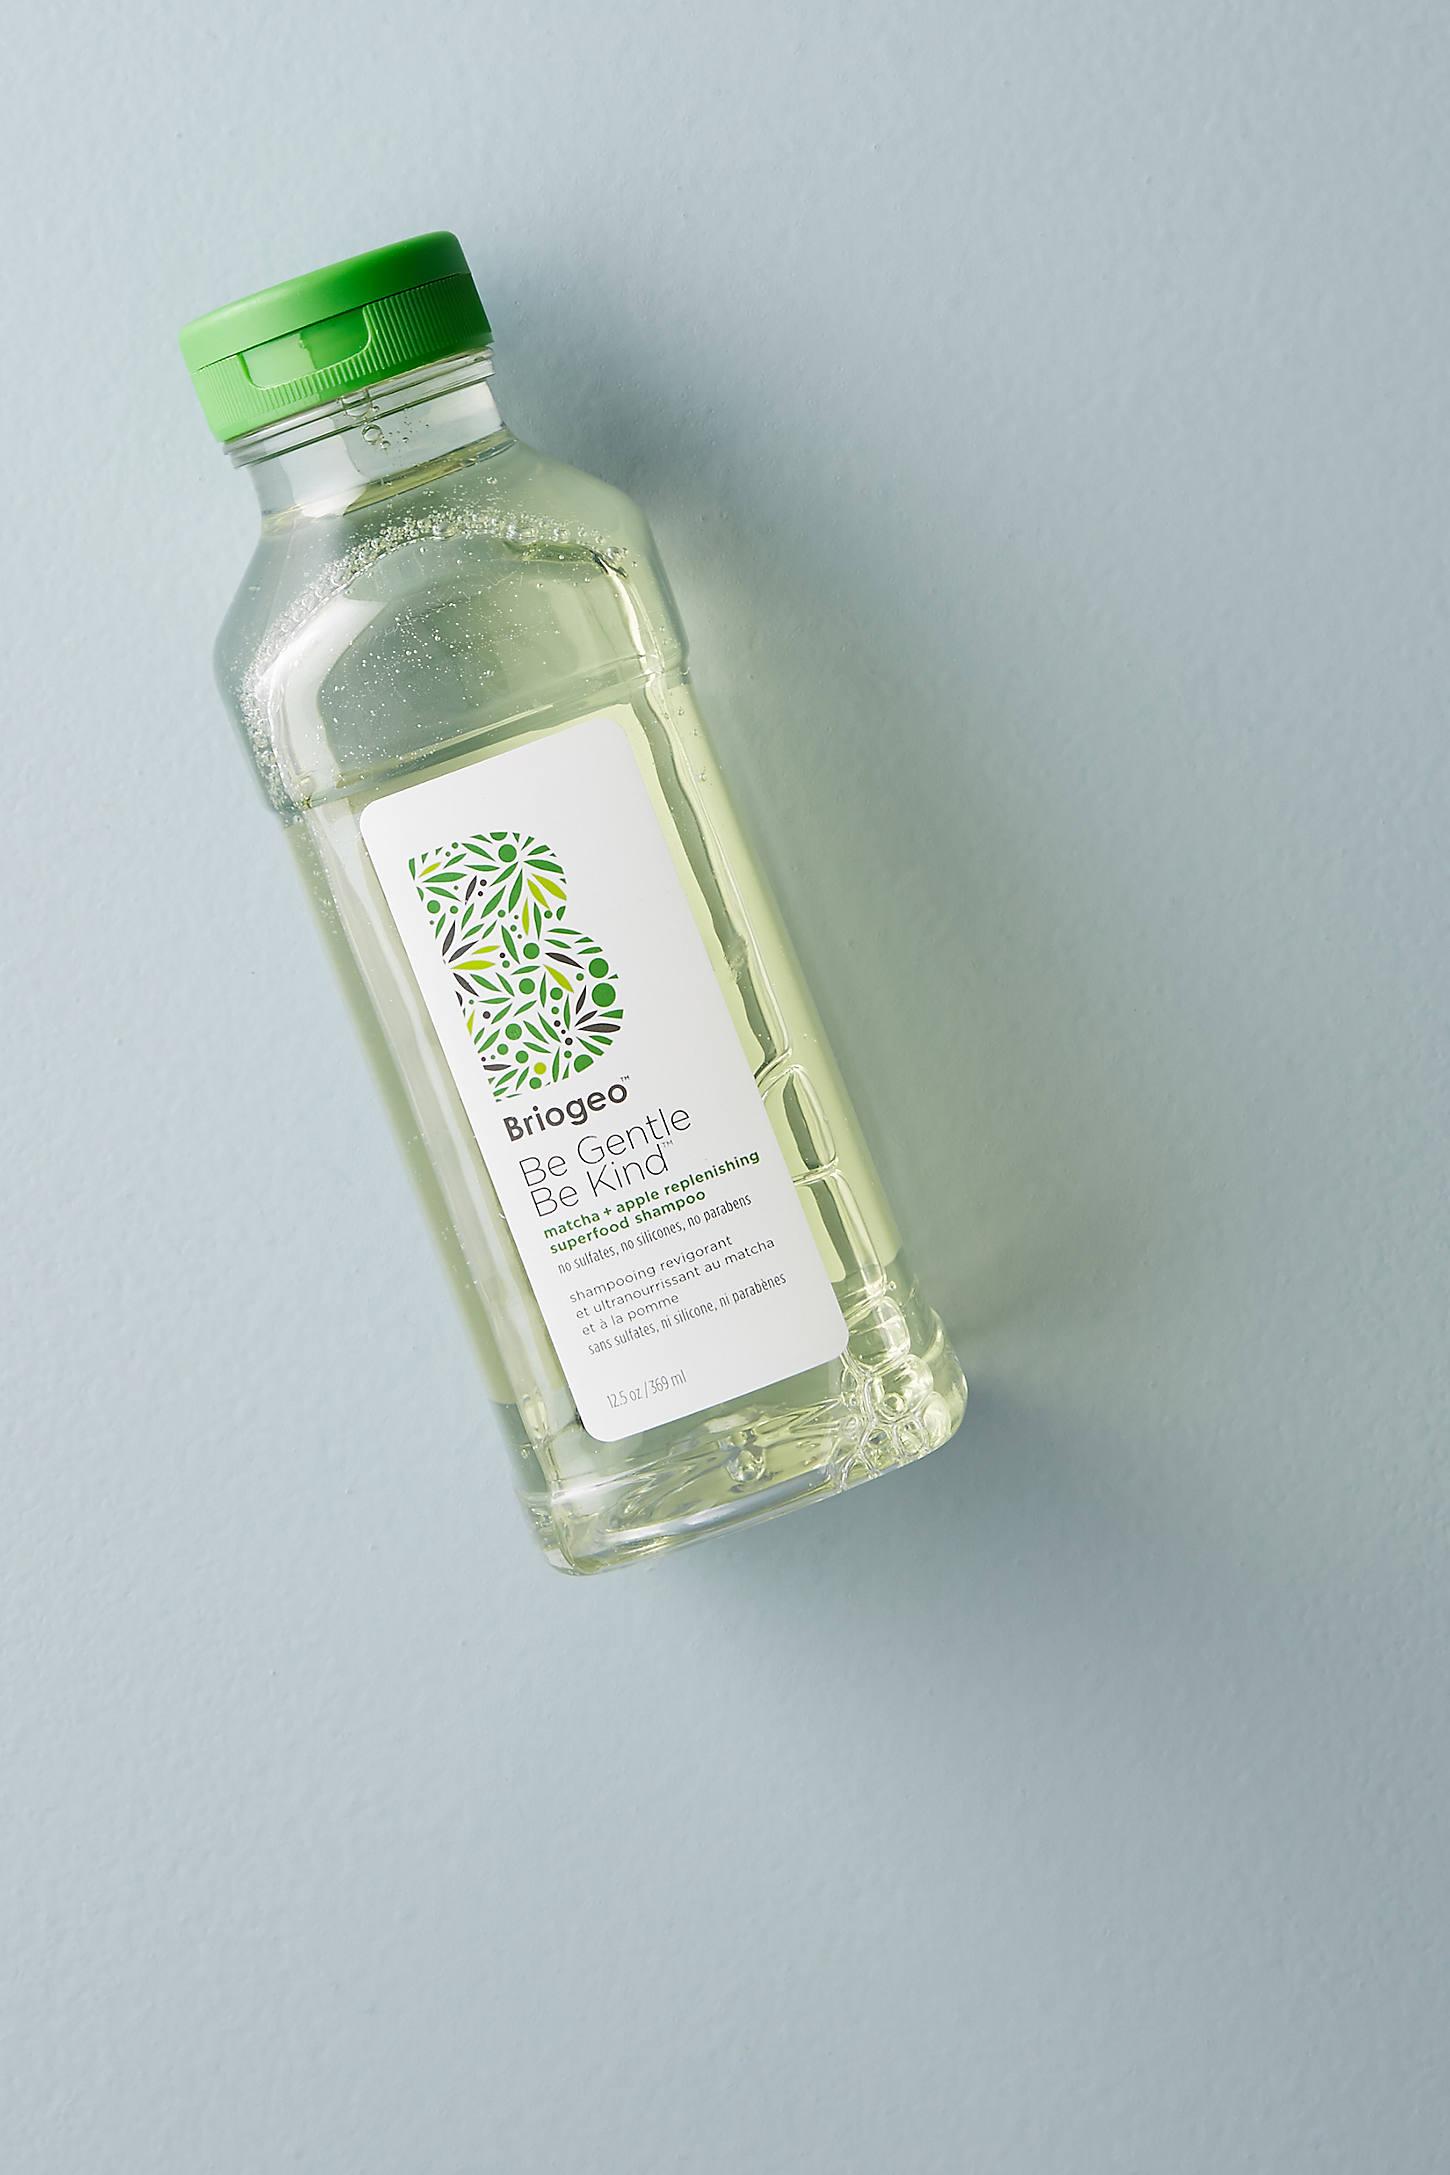 Briogeo Be Gentle Be Kind™ Kale + Apple Replenishing Superfood Conditioner In Green